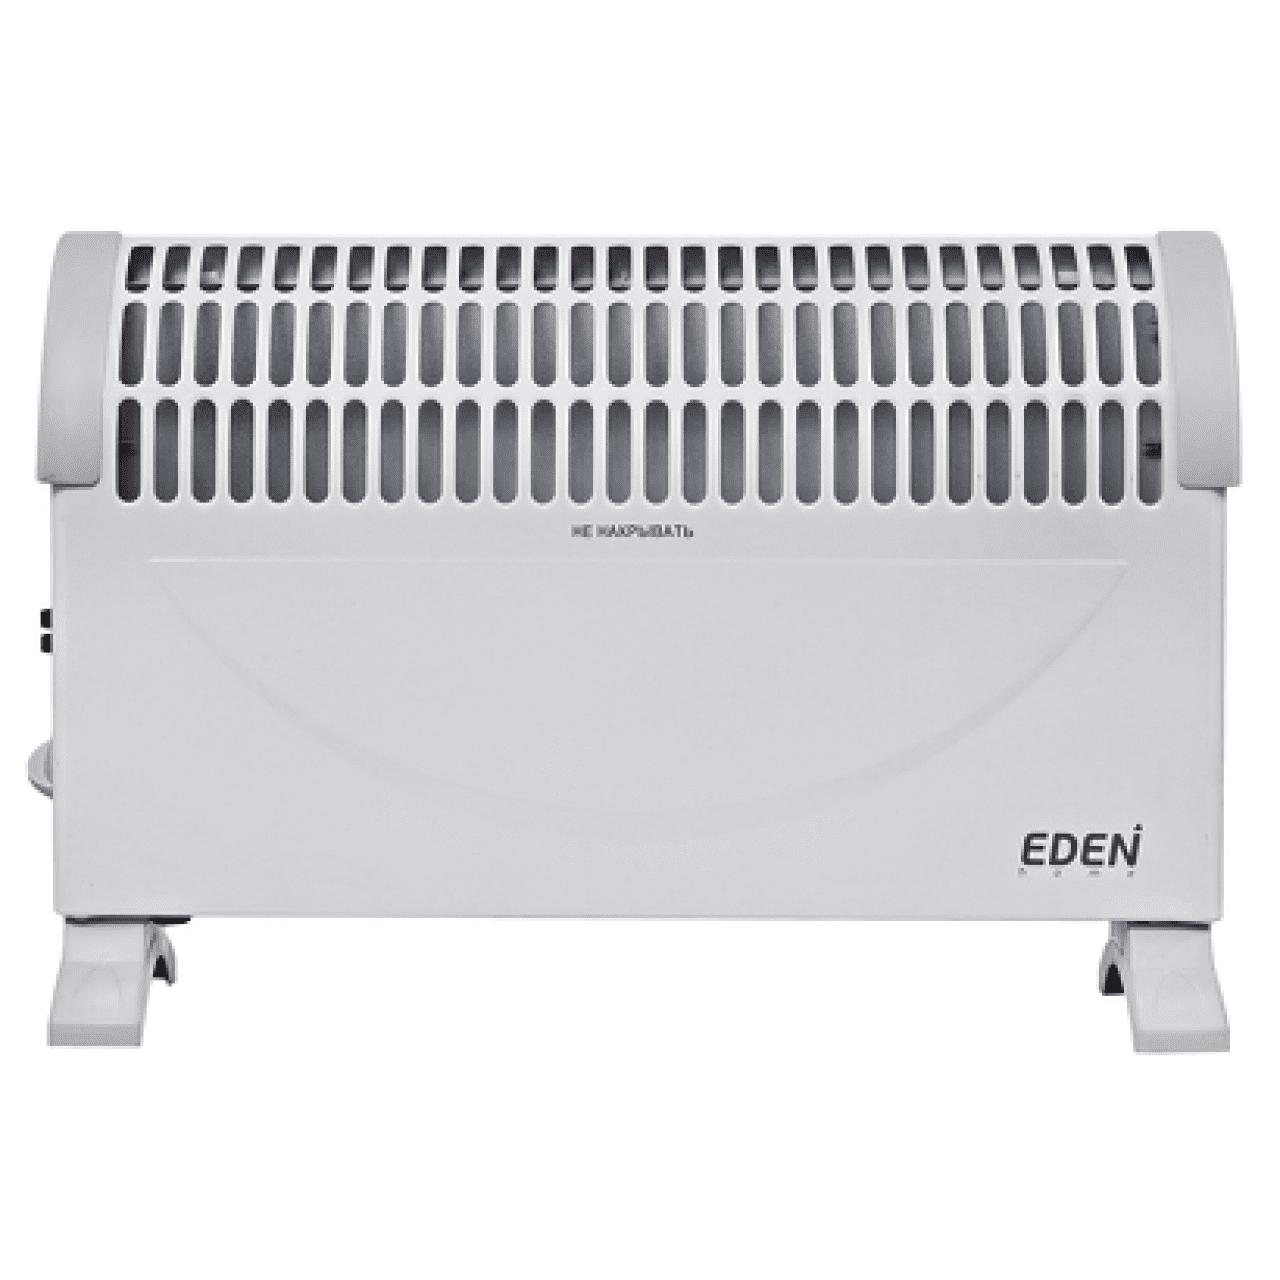 Конвектор Eden EDY-2200